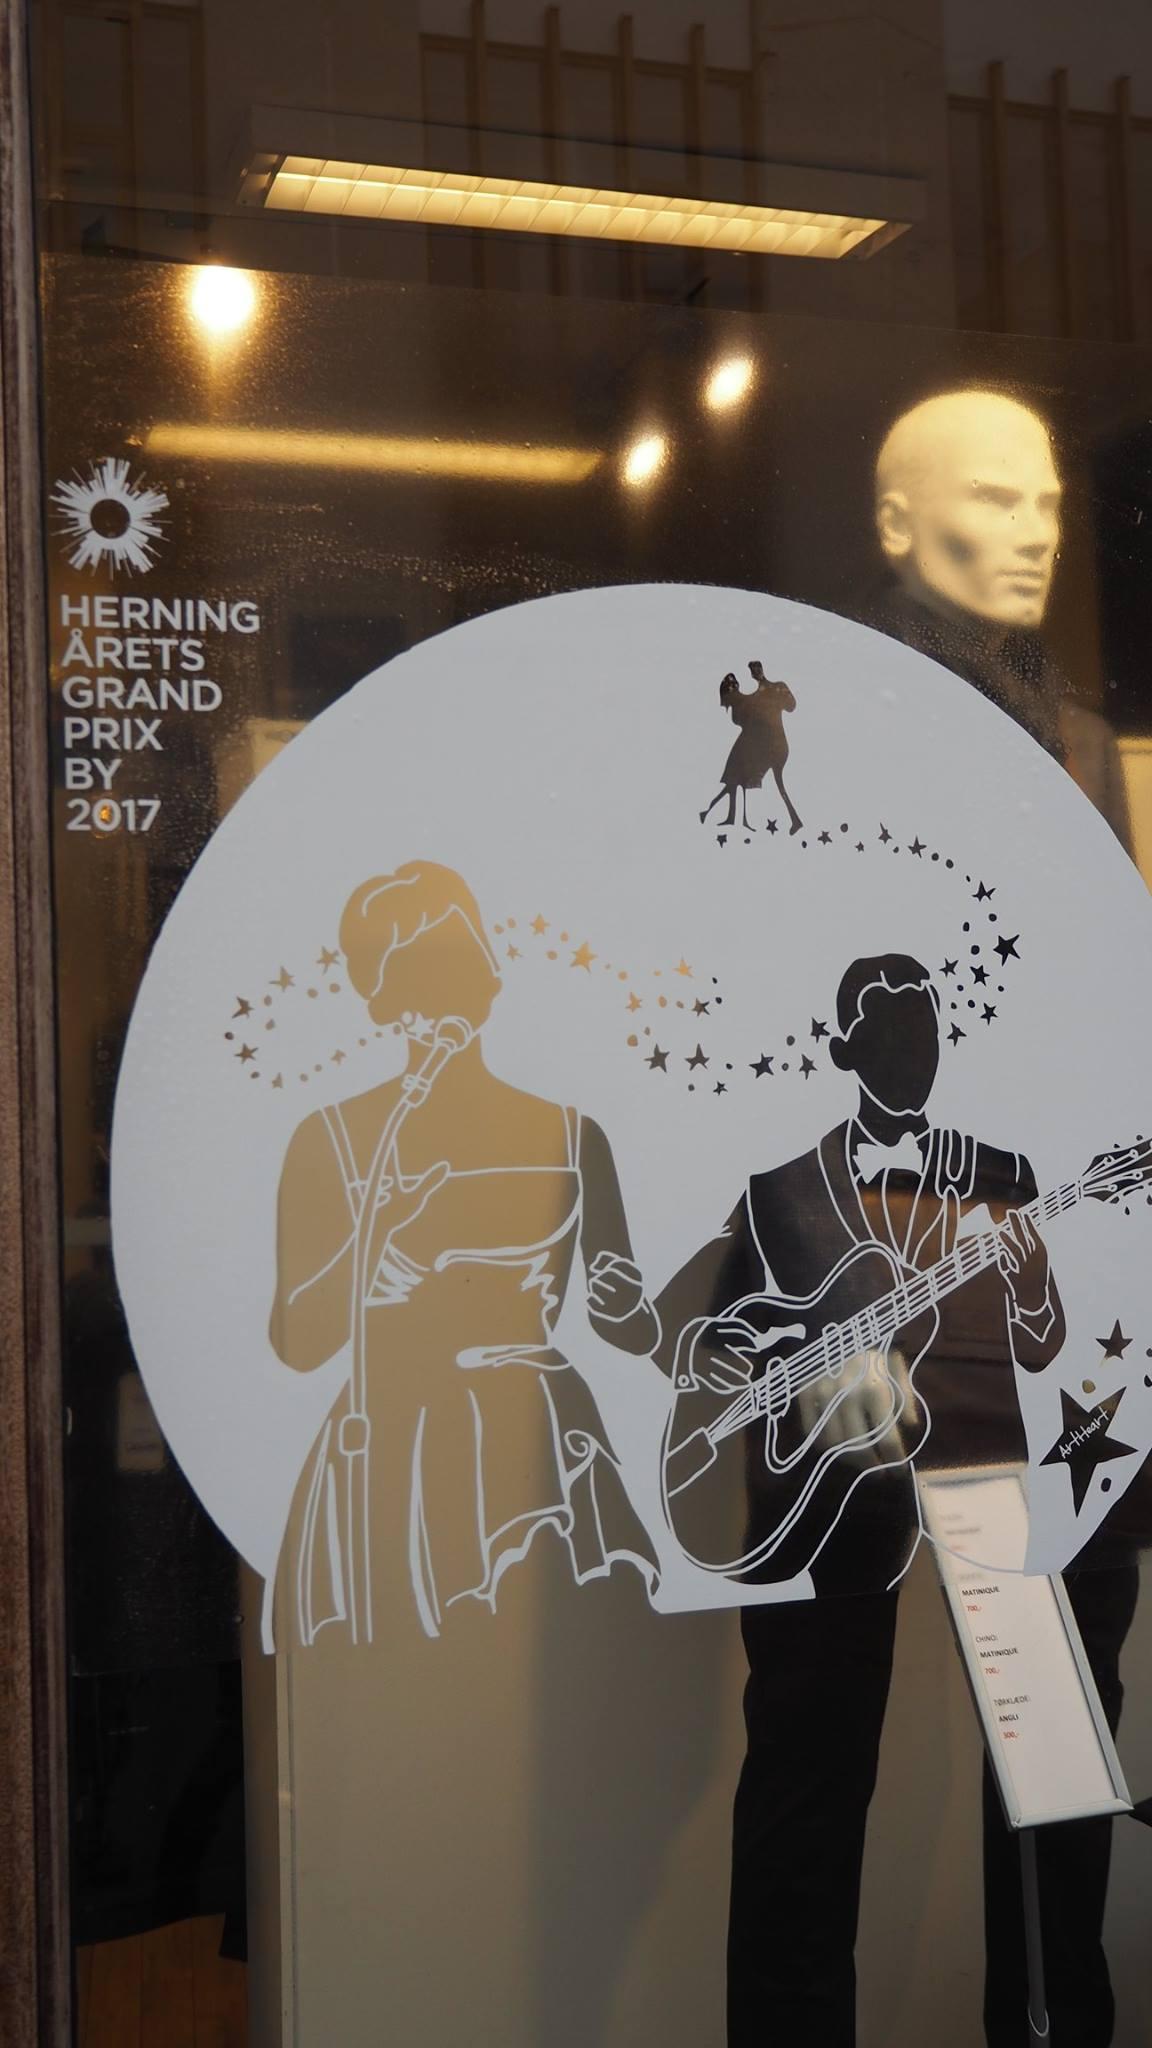 Melodi Grand Prix Herning 2017 - Dansevise